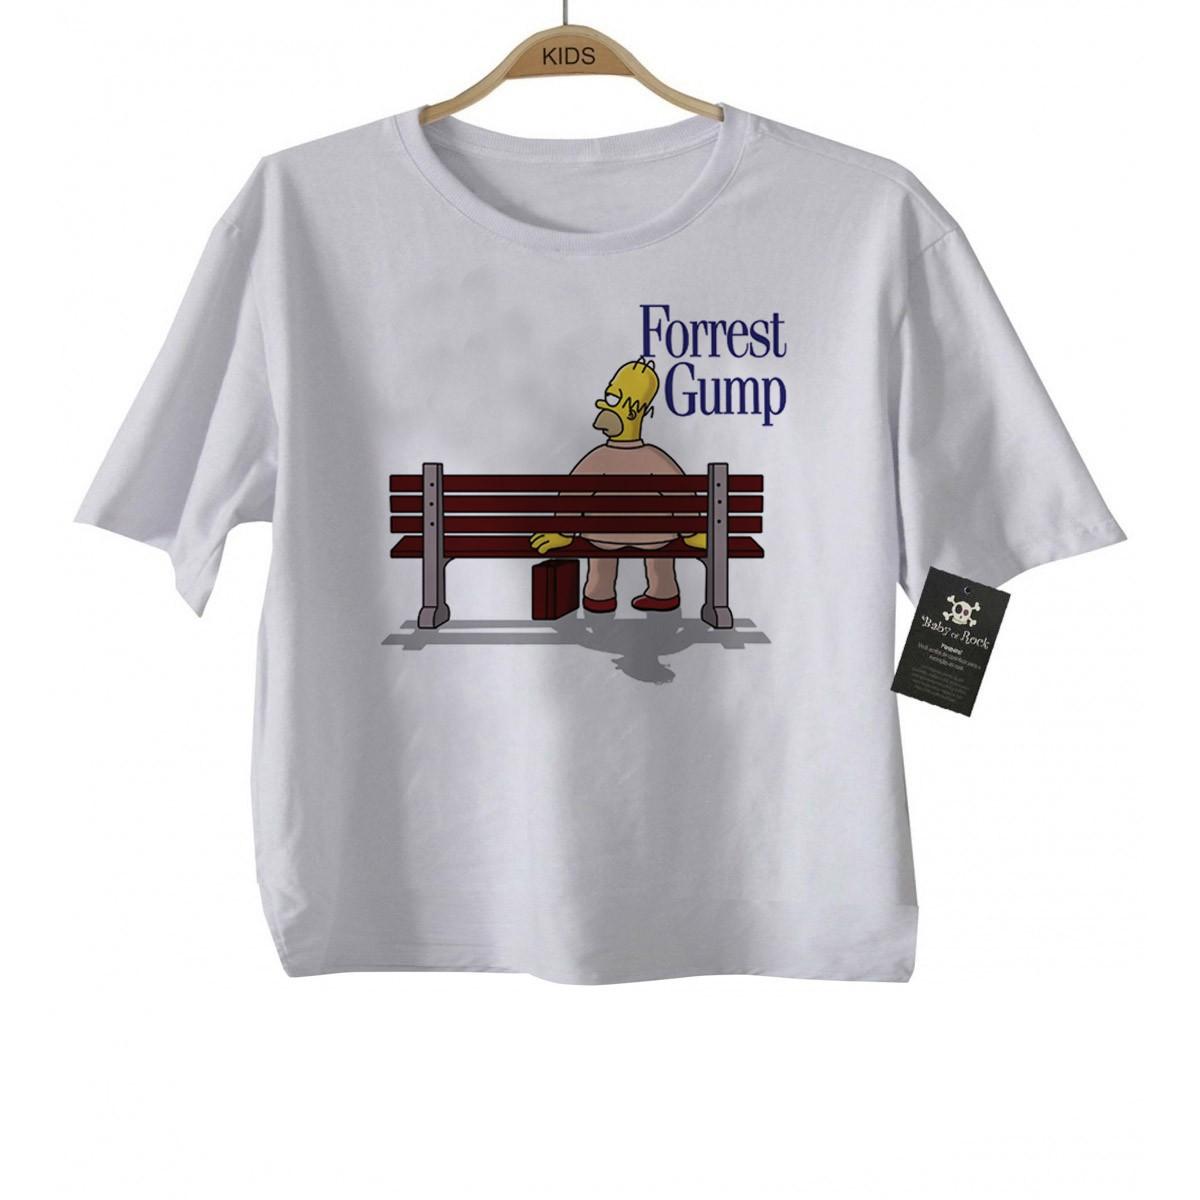 Camiseta de Filme Infantil - Forrest Gump - White  - Baby Monster S/A